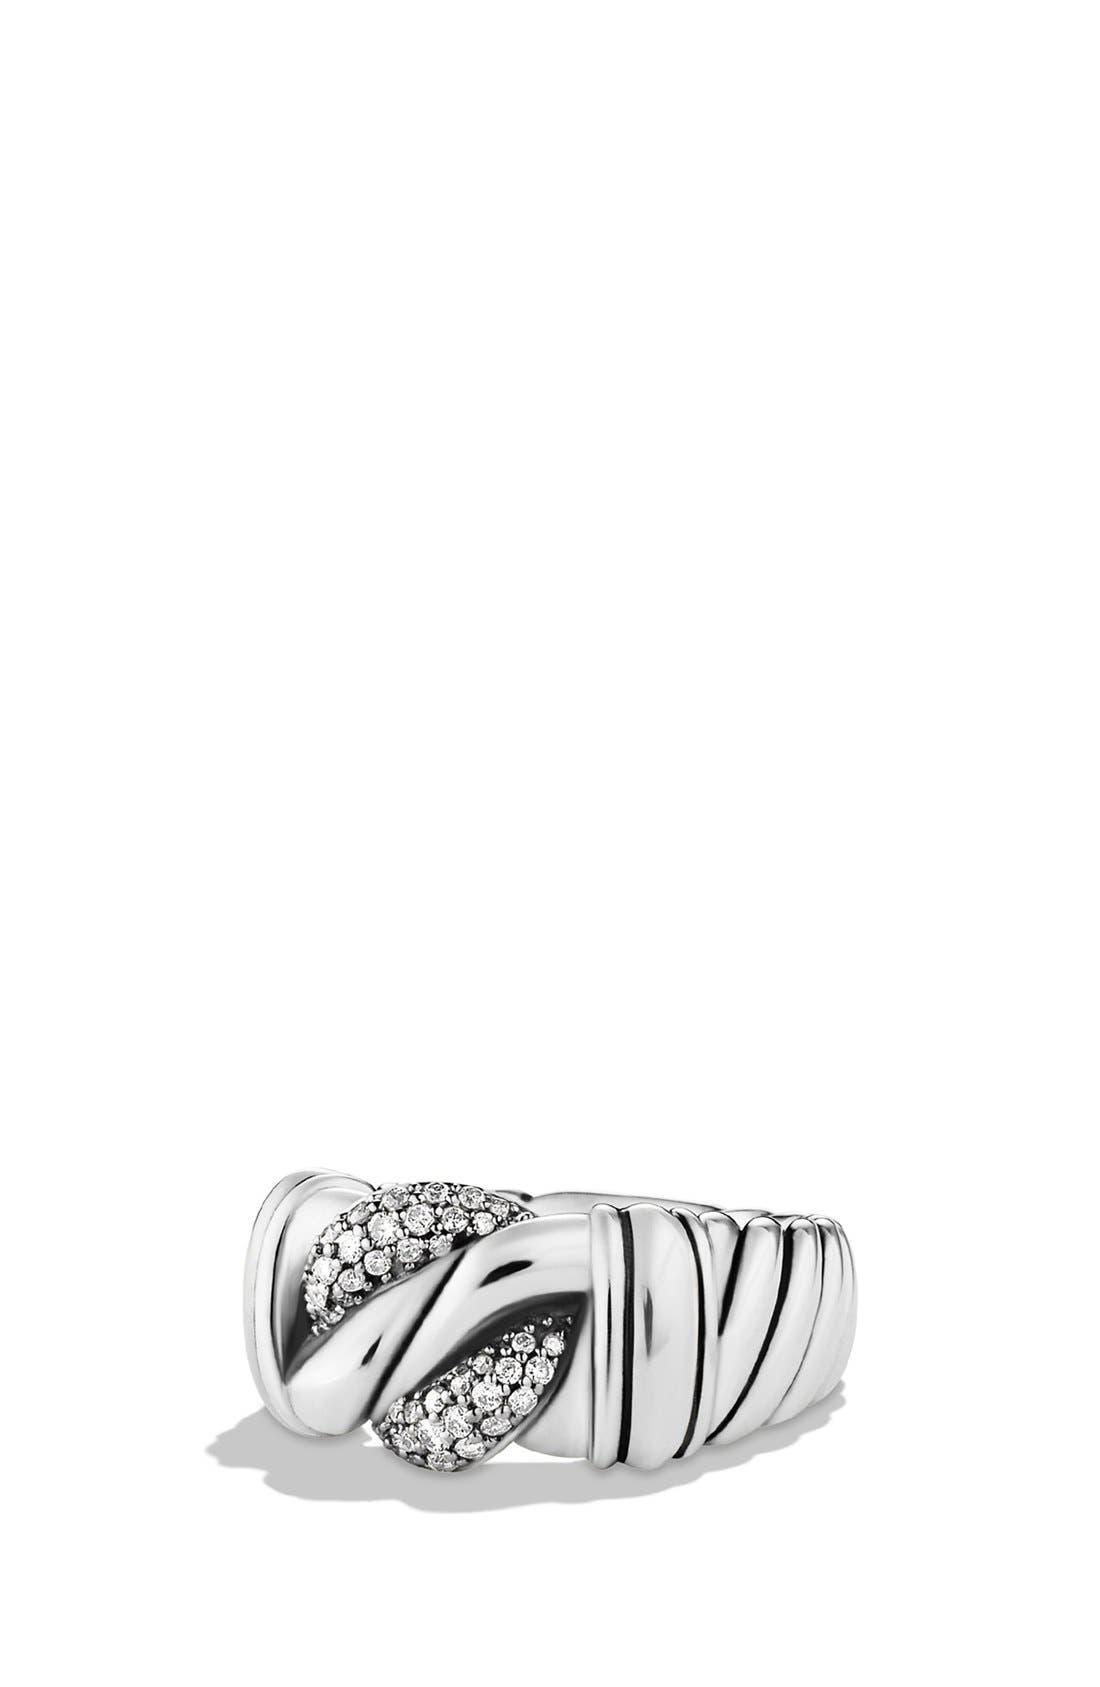 Main Image - David Yurman 'Metro' Curb Wide Ring with Diamonds